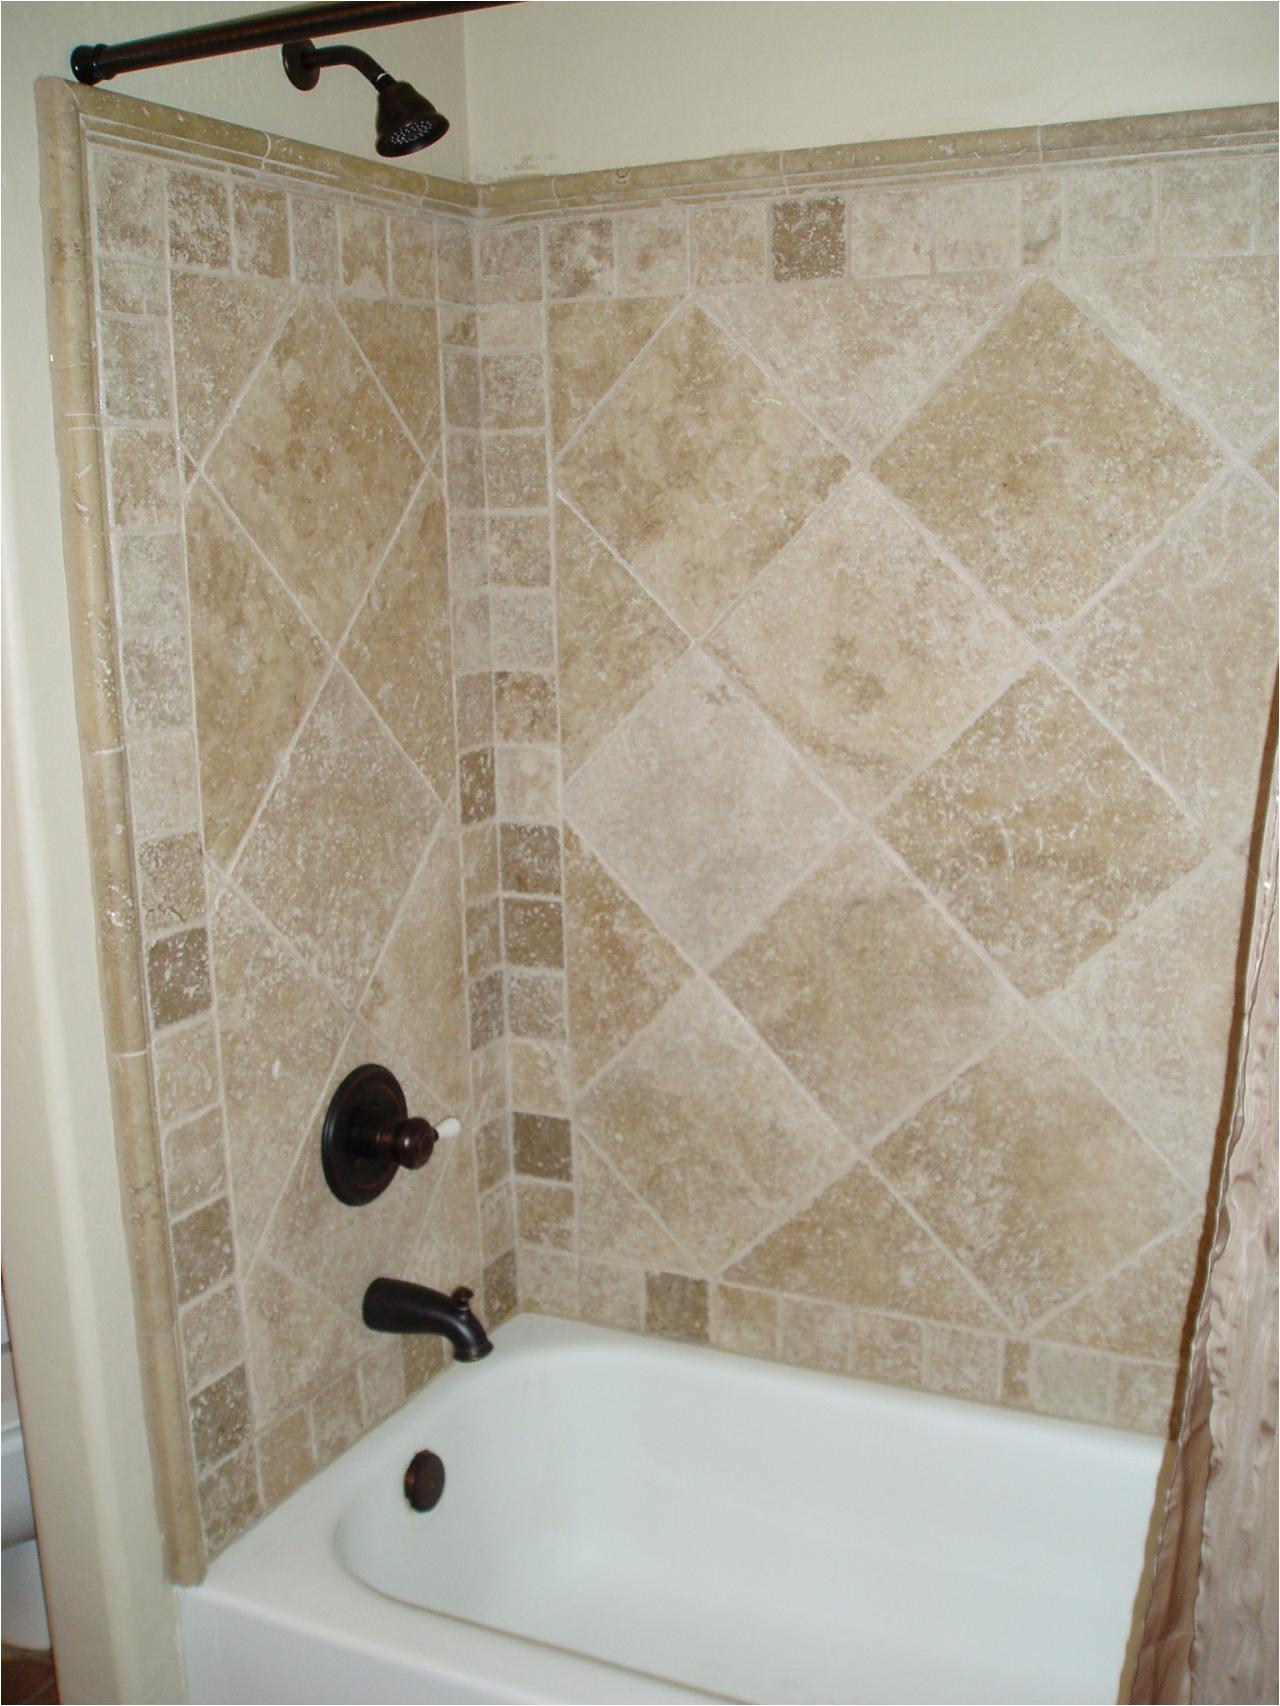 One Piece Bathtub Enclosures Bathroom Installation Simple and Secure with Bathtub